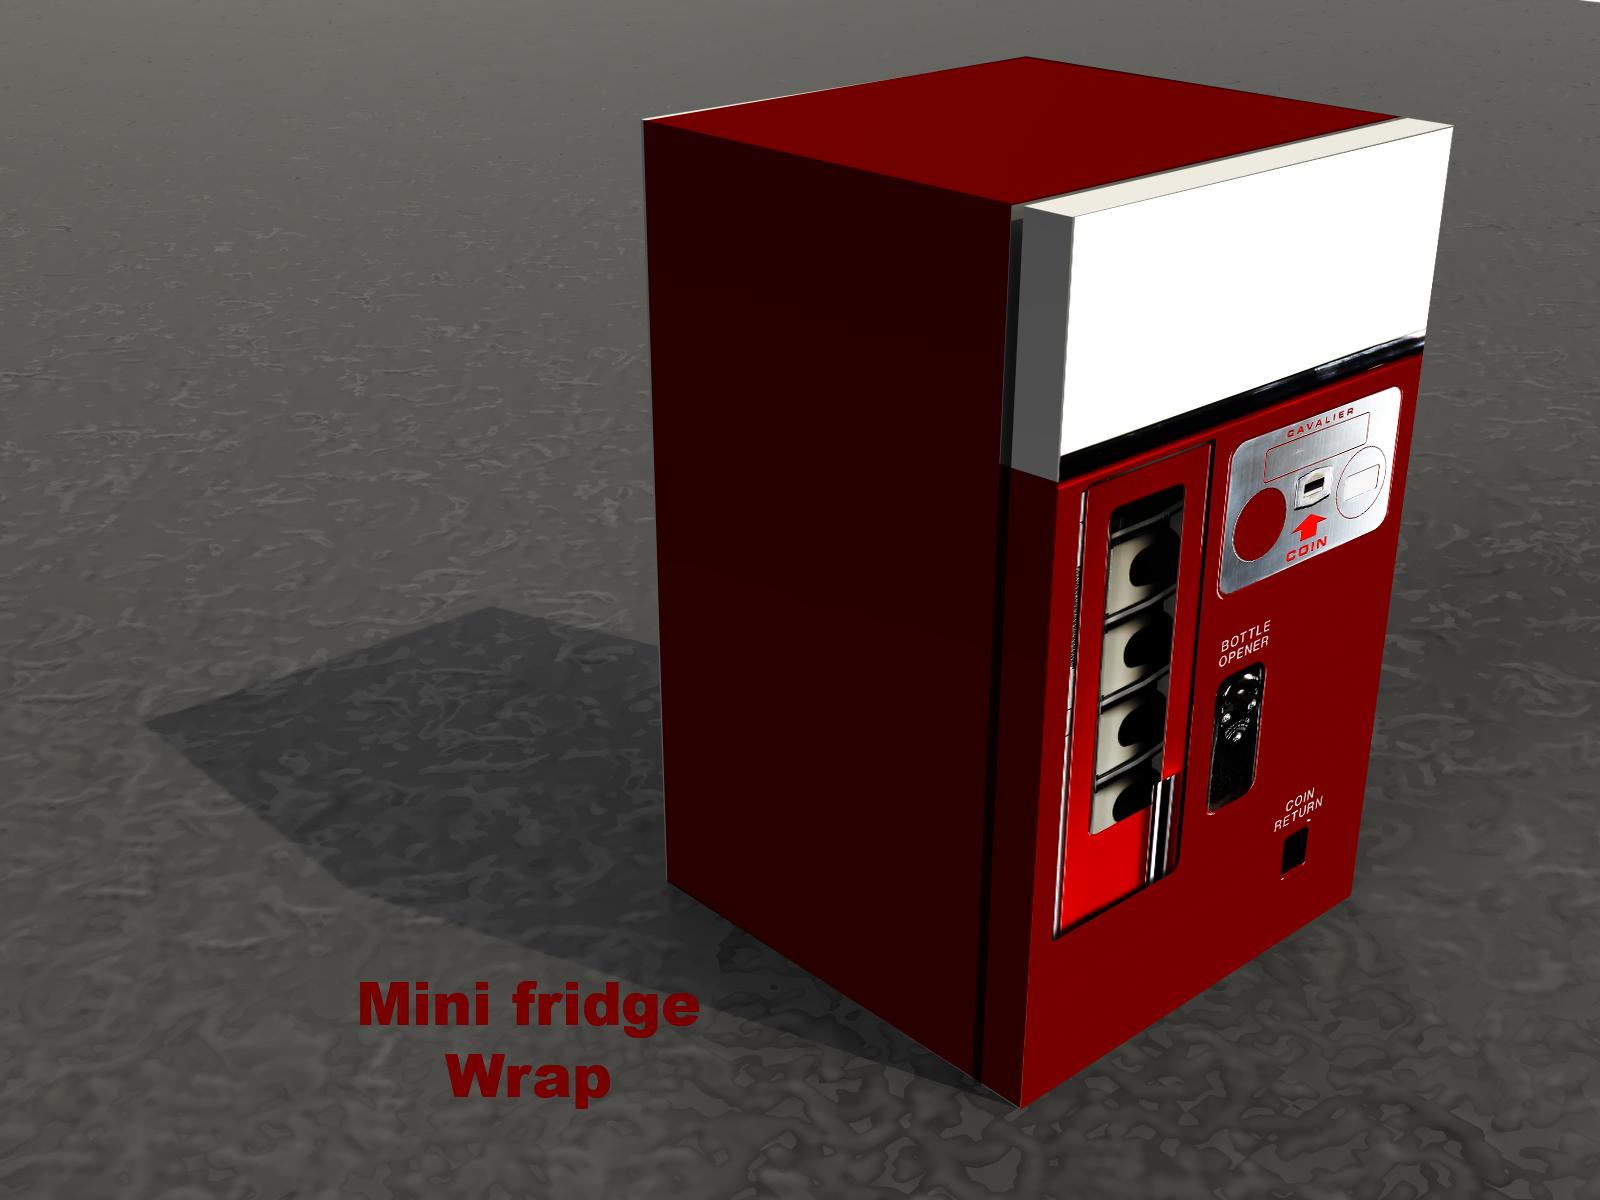 Red Vended machine, mini fridge wrap, Rm wraps